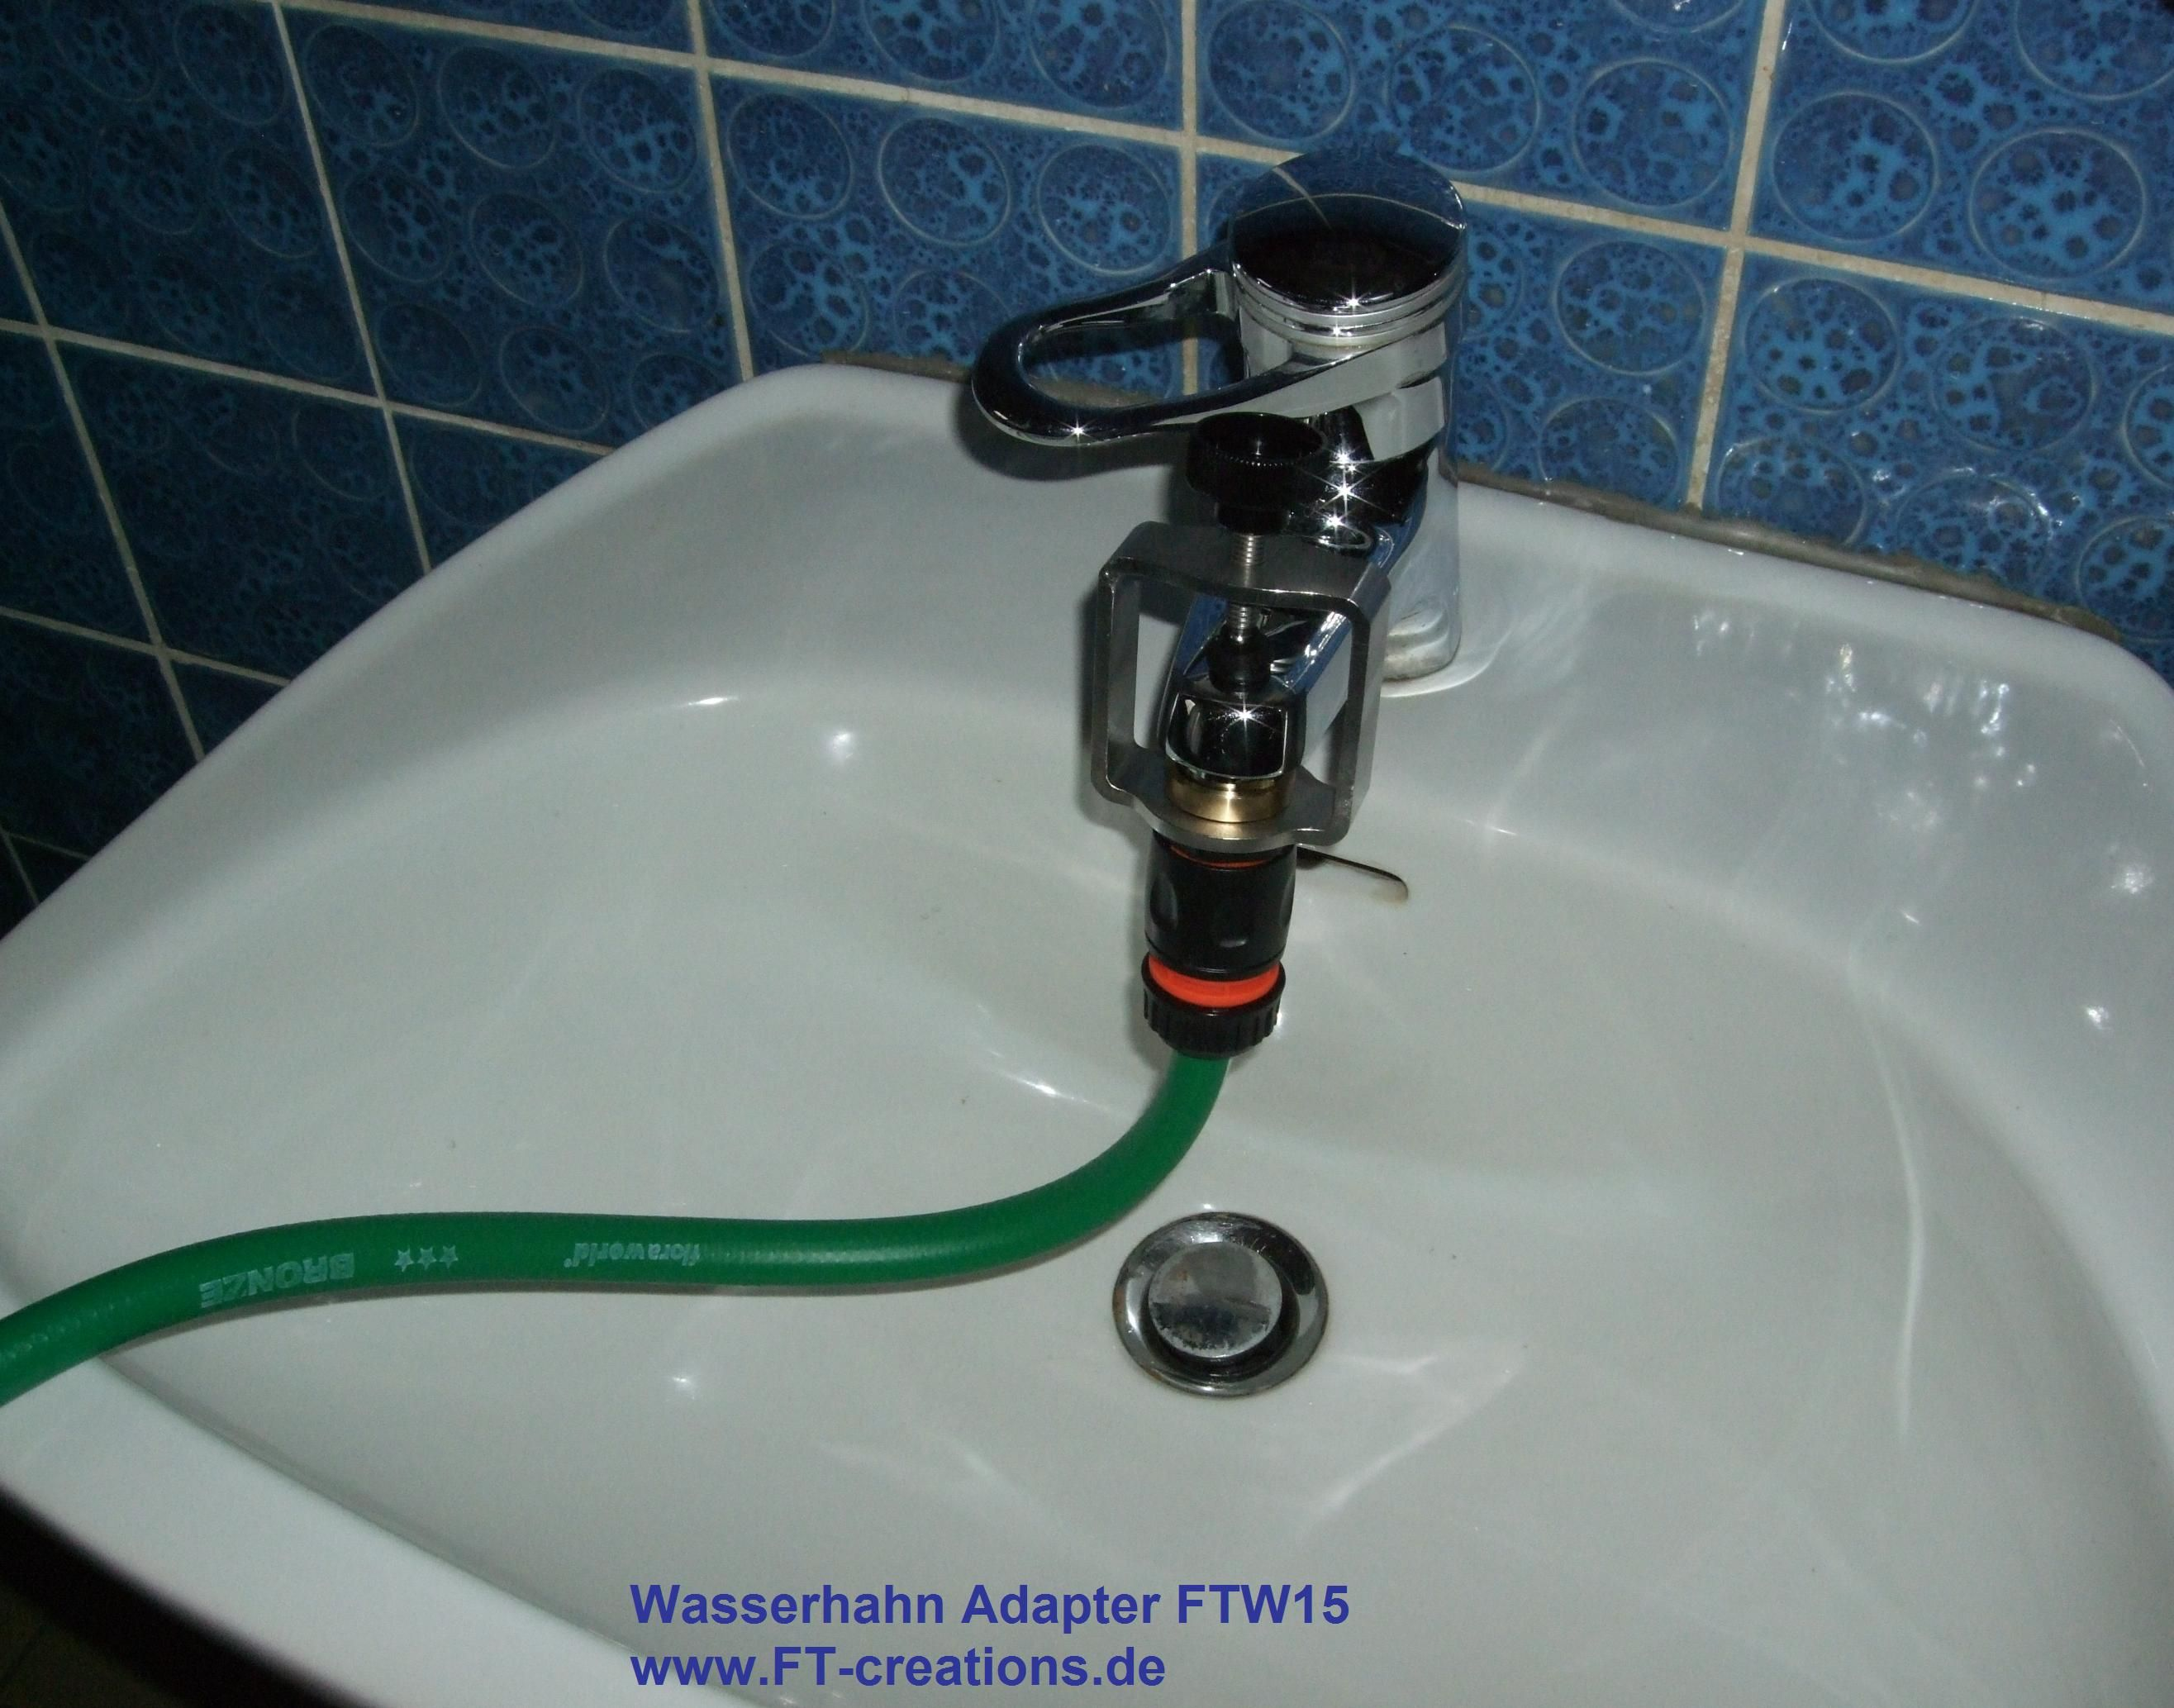 wasserhahn adapter ftw15 mit angeschlossenem garten schlauch wasserhahn adapter wasserhahn. Black Bedroom Furniture Sets. Home Design Ideas